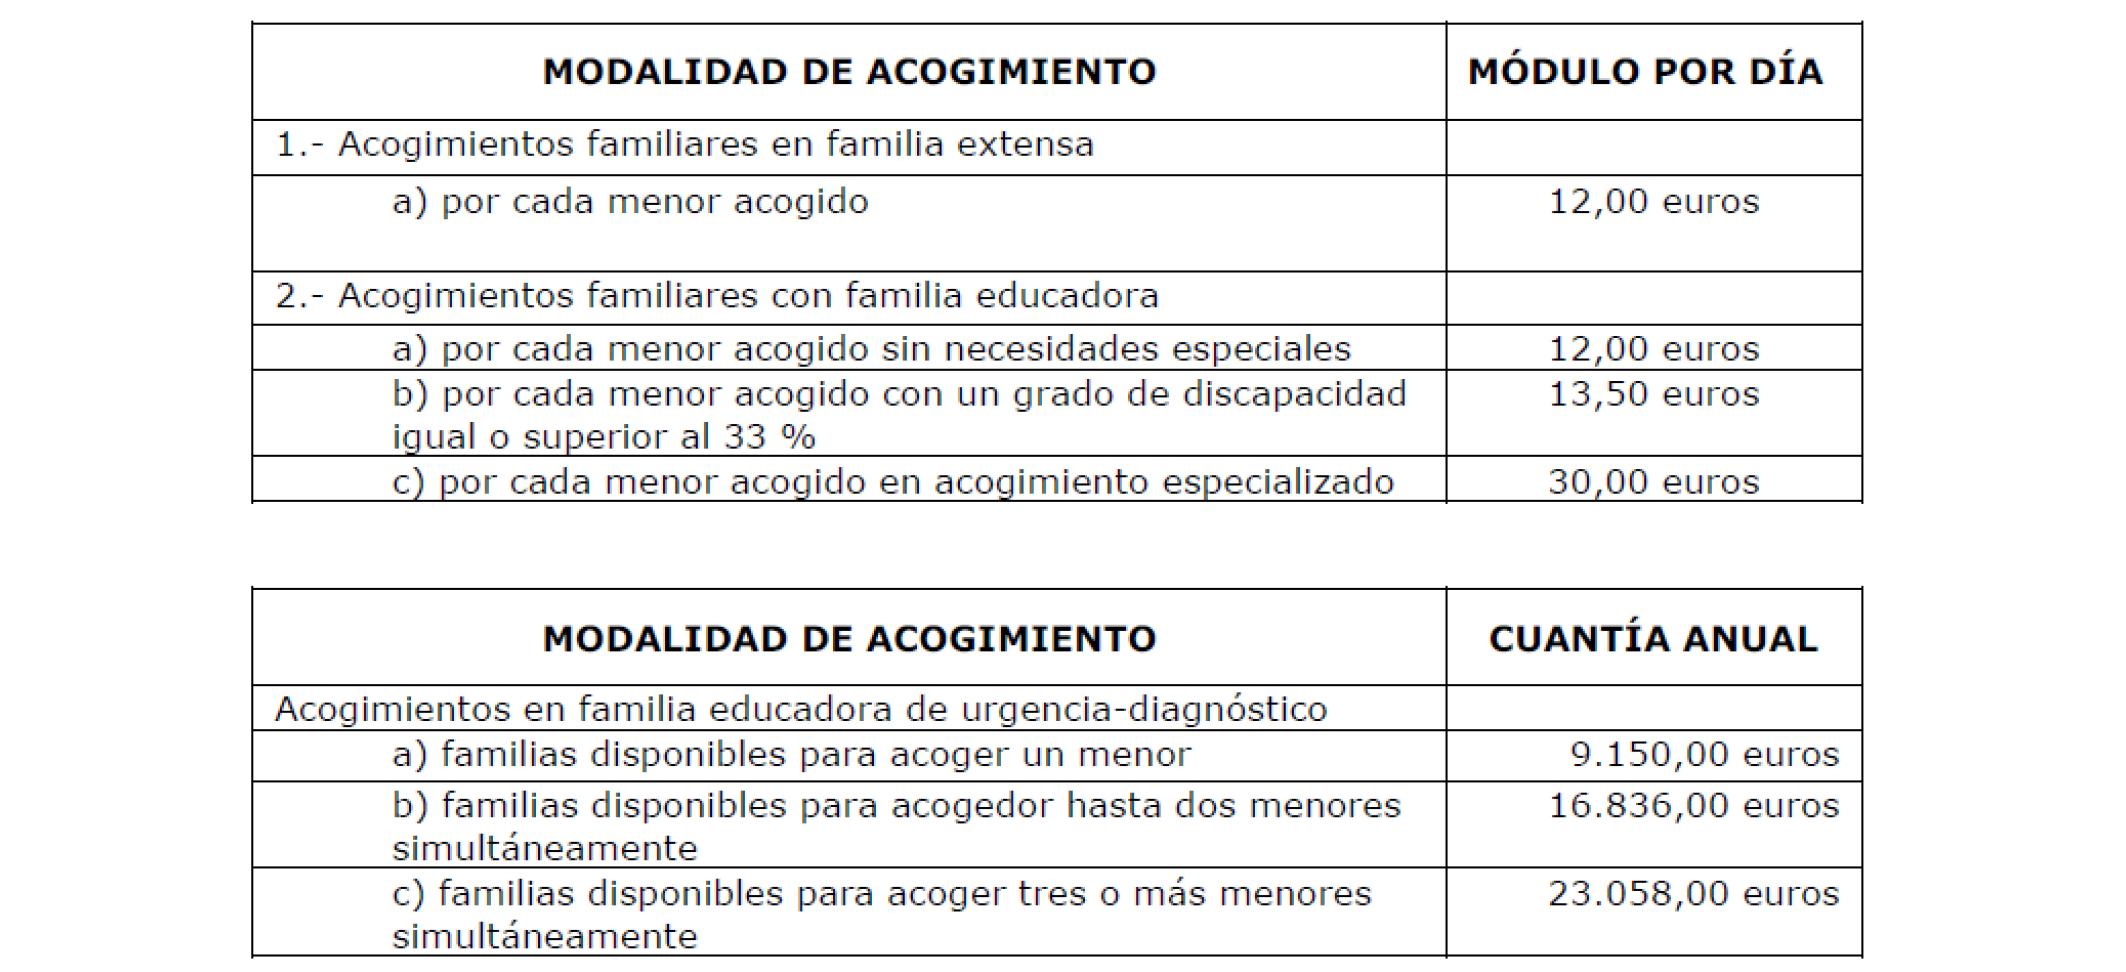 Excelente Reanudar Habilidades De Venta Modelo - Colección De ...